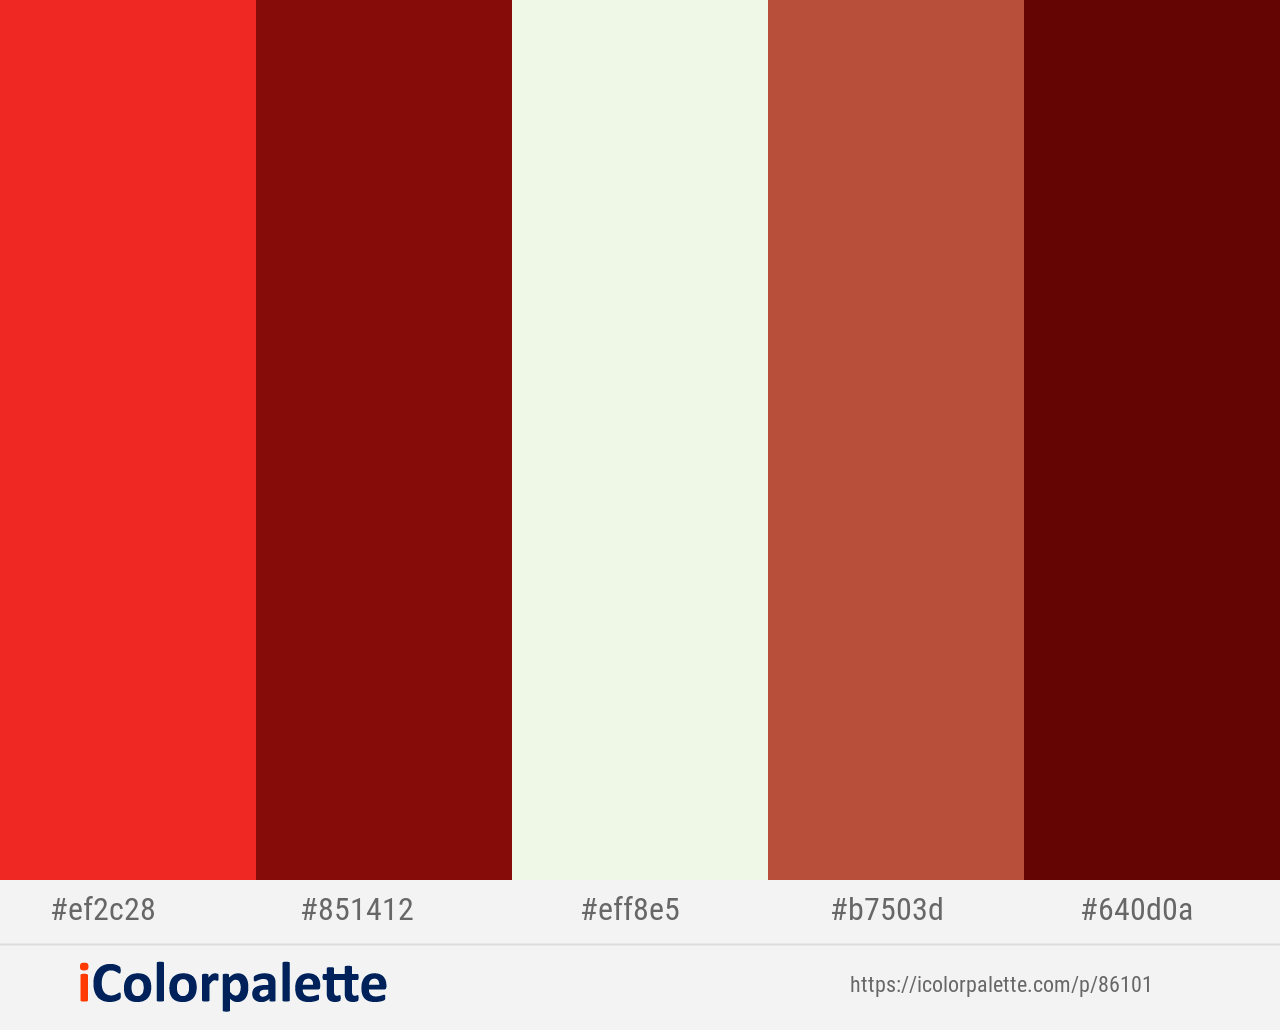 Pomegranate Tamarillo Frost Crail Mahogany Color Scheme Icolorpalette Mahogany Color Red Colour Palette Color Schemes